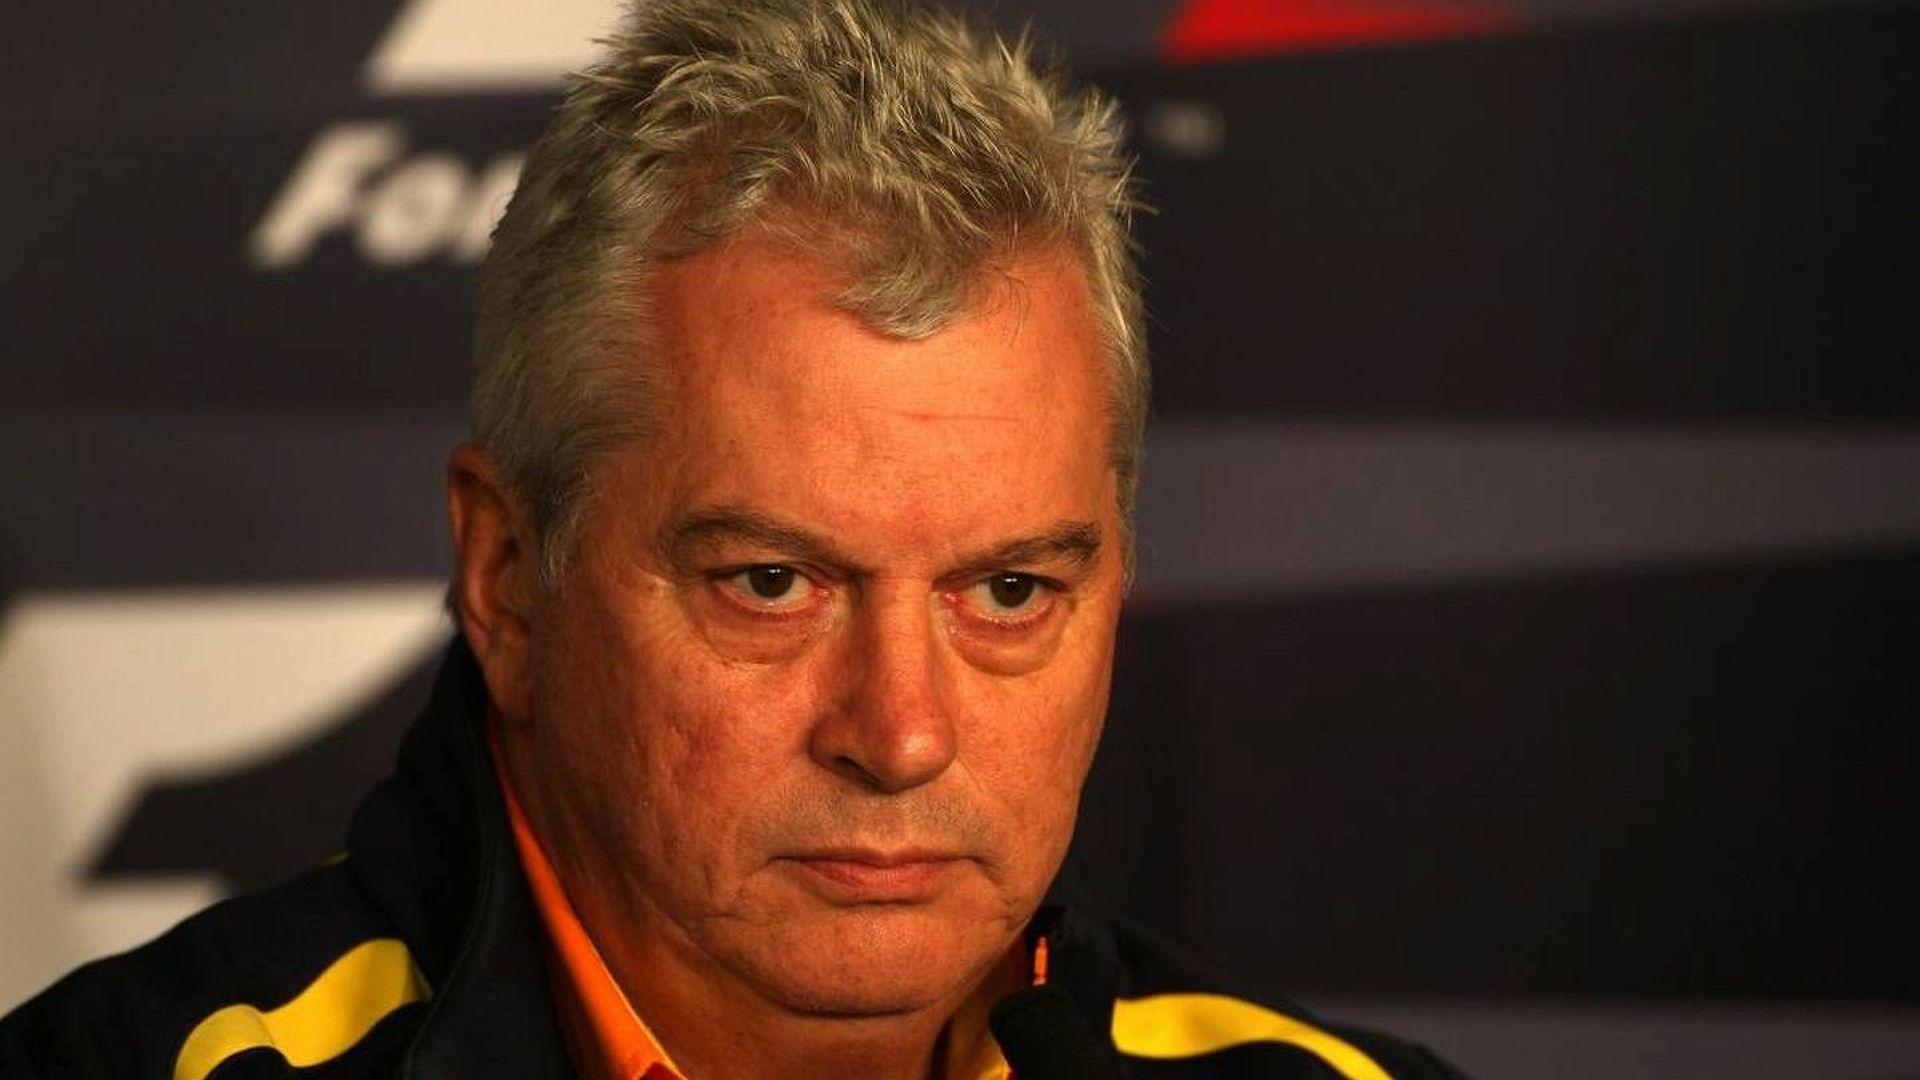 Symonds said 'be careful' before Piquet crash